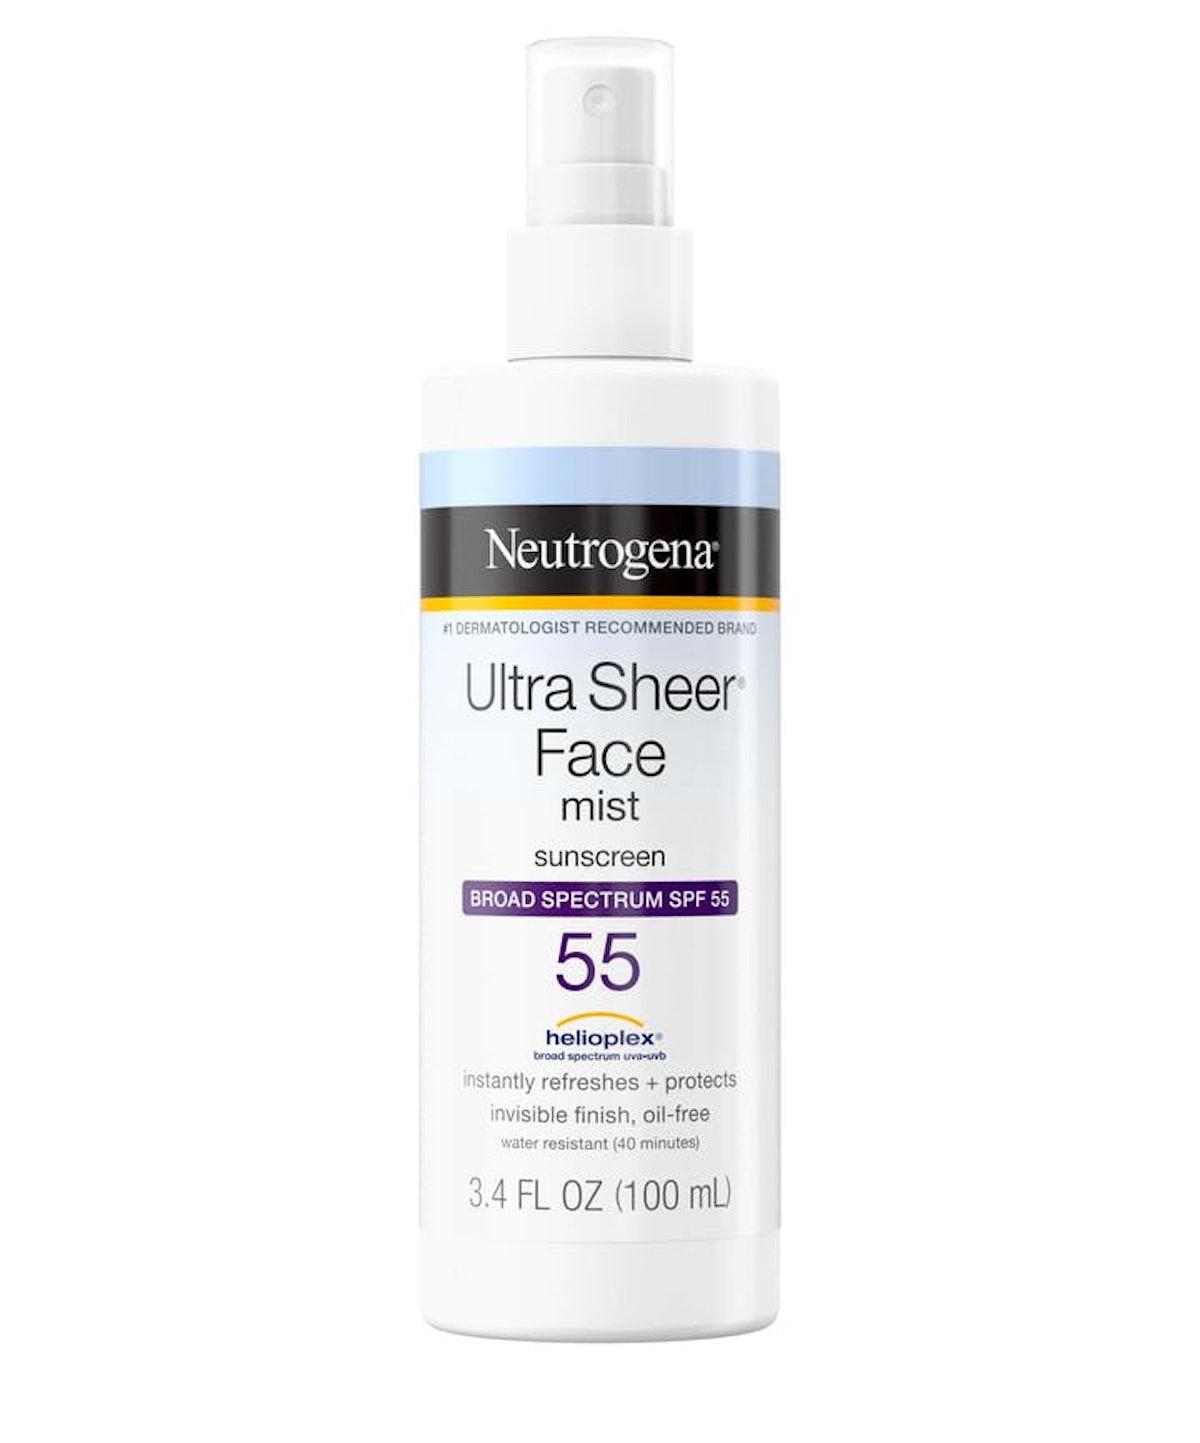 Ultra Sheer Face Mist Sunscreen Broad Spectrum SPF 55